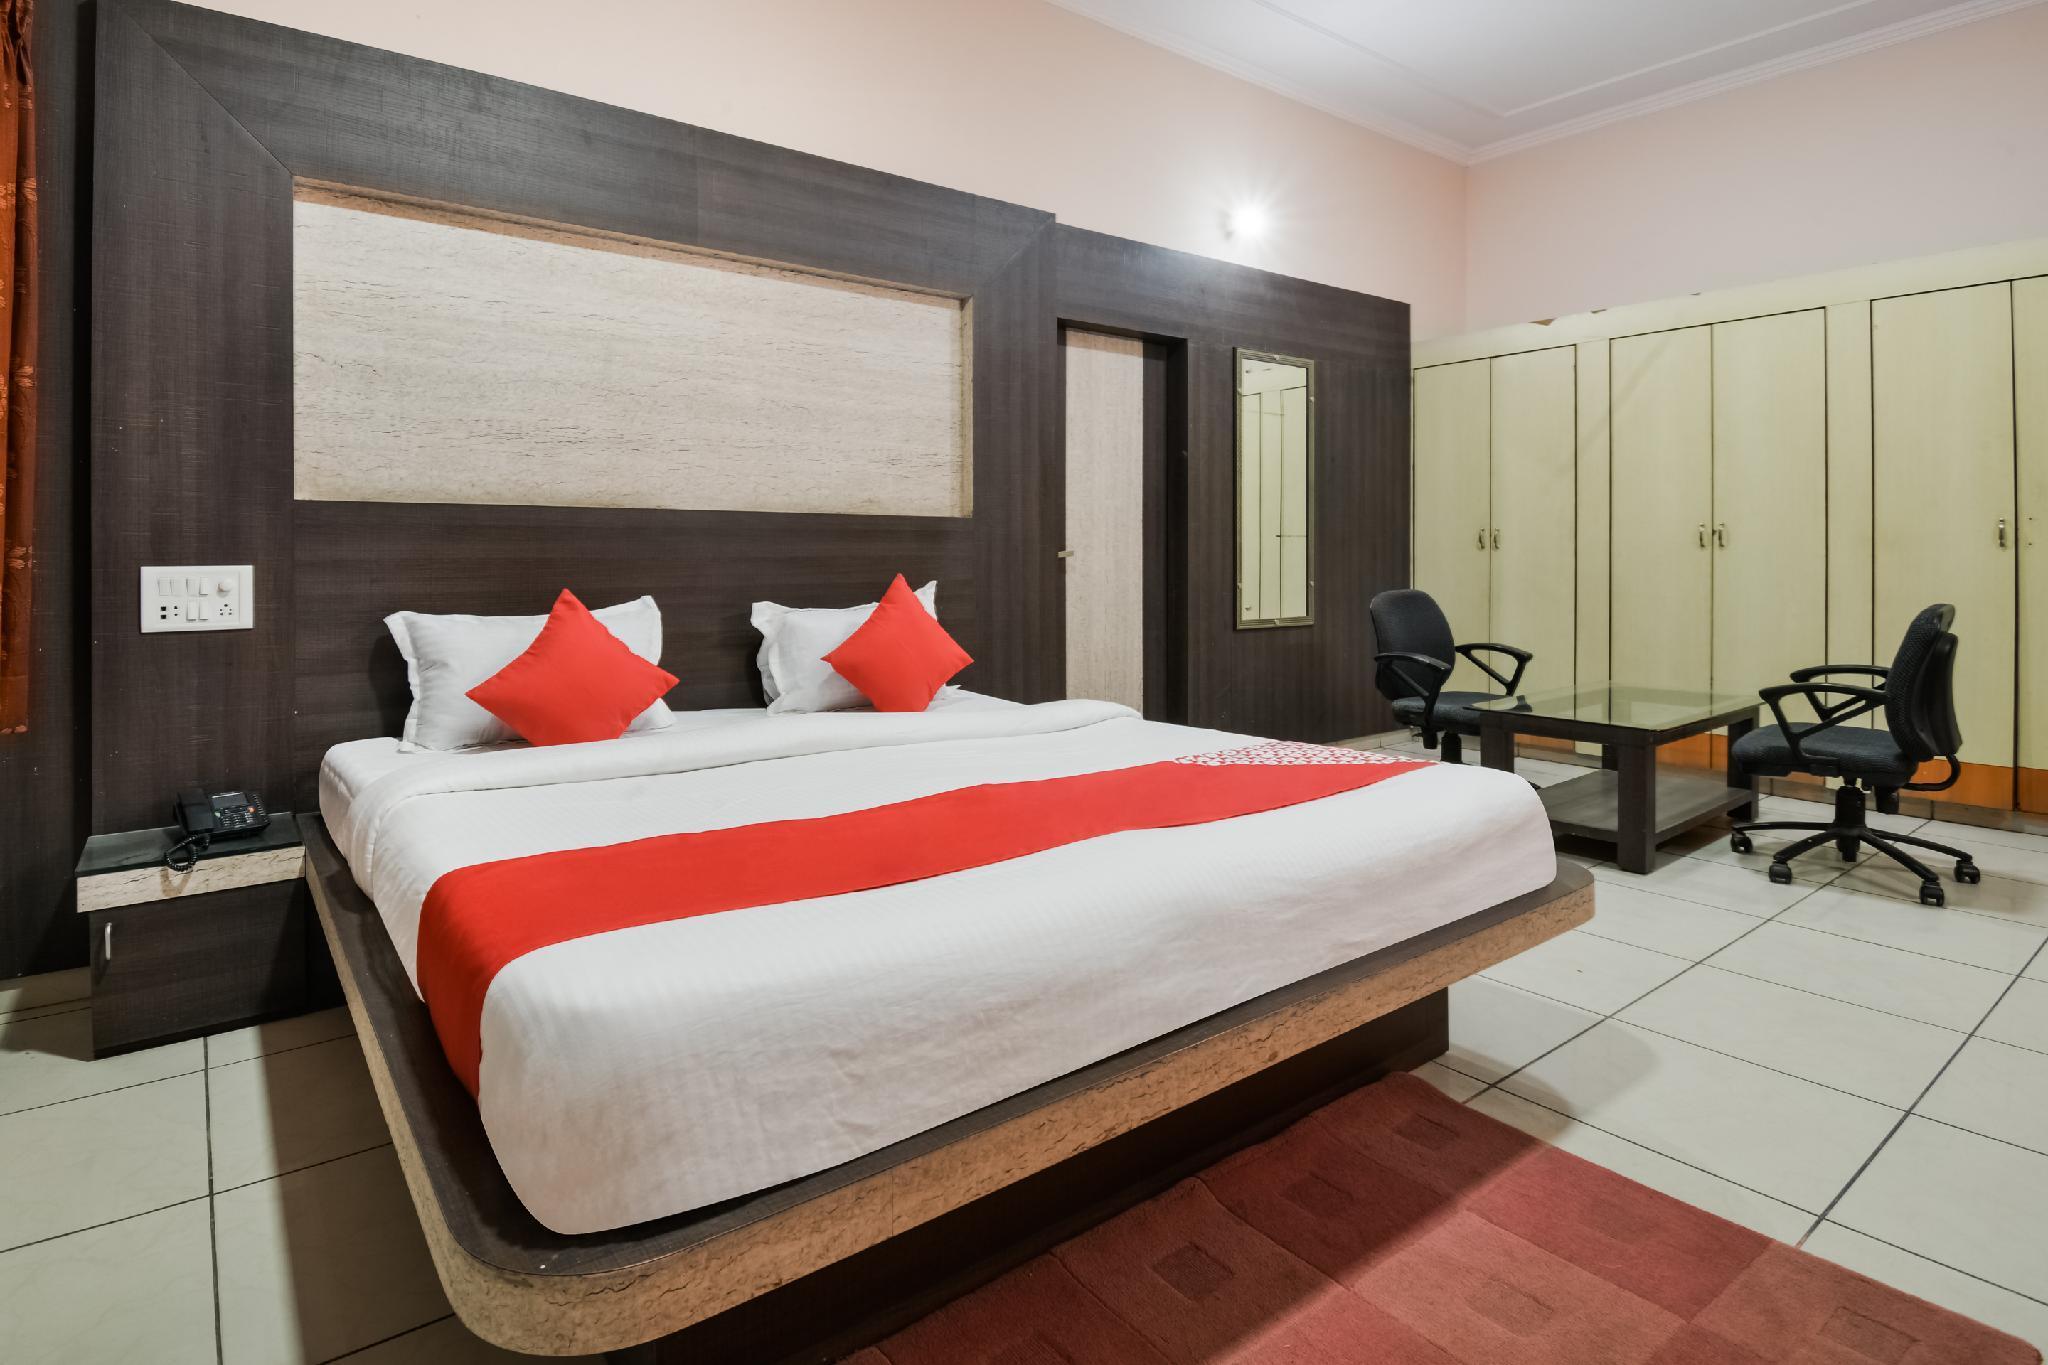 OYO 40935 Vishwakarma Hotel And Restaurant, Sikar